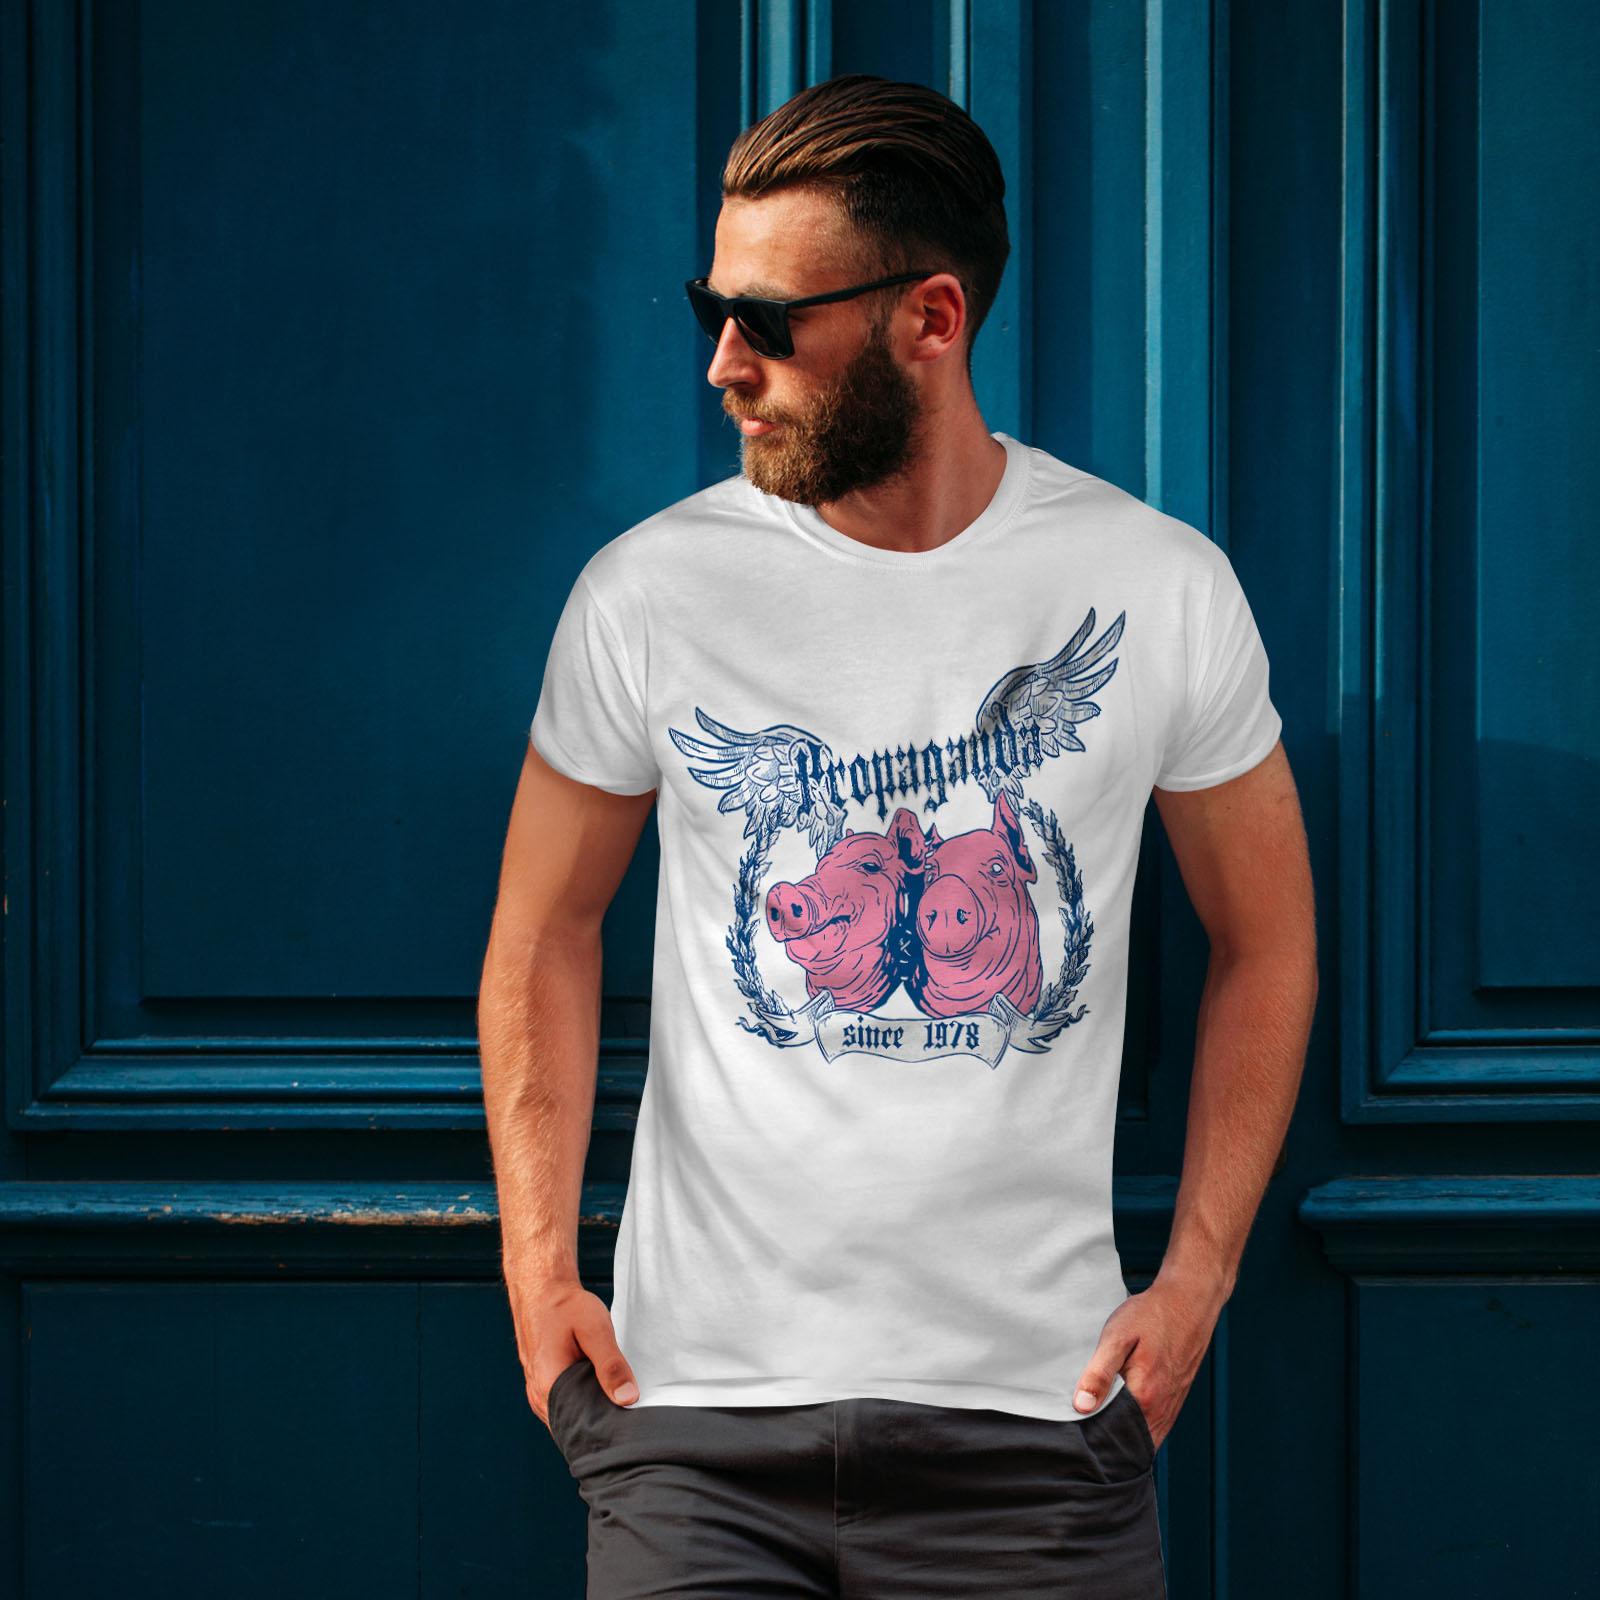 Bored Graphic Design Printed Tee Wellcoda Propaganda Pig Vintage Mens T-shirt